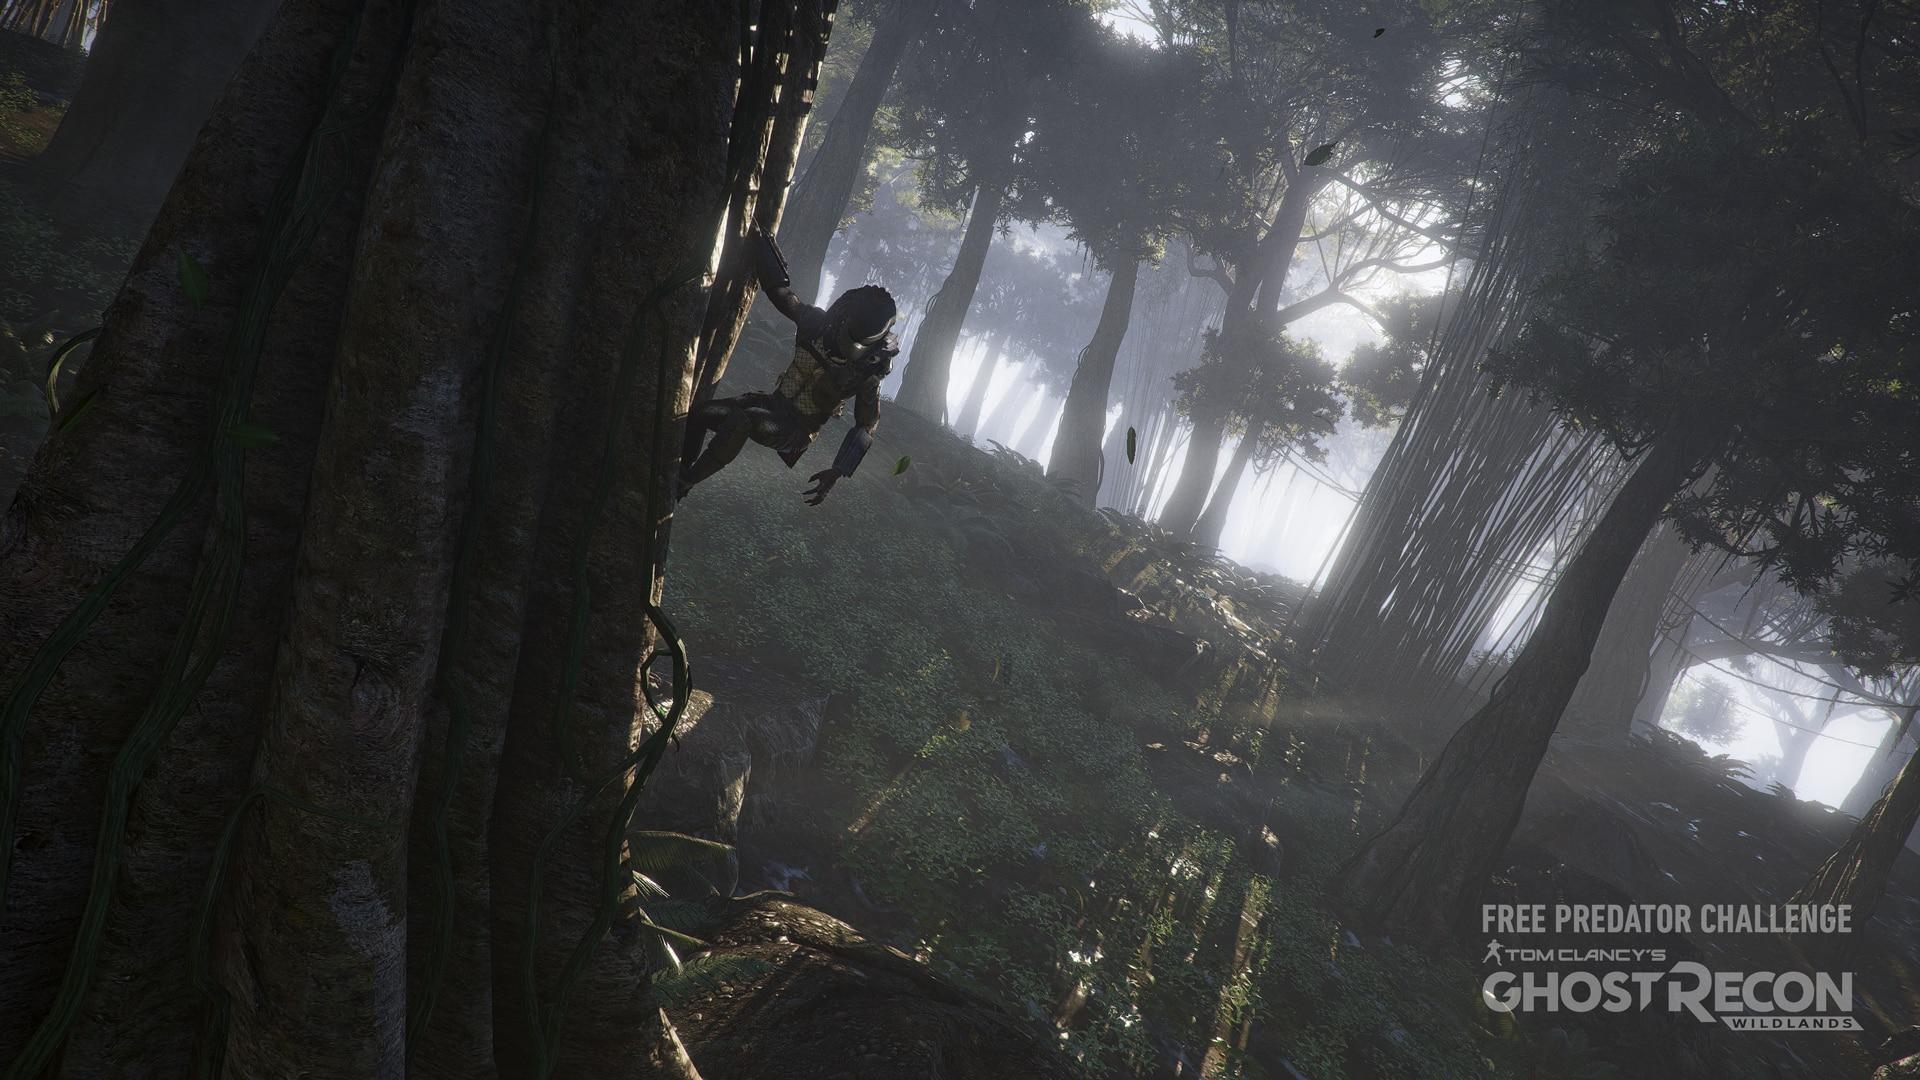 Ghost Recon: Wildlands Shows Predator Challenge Combat, Rewards